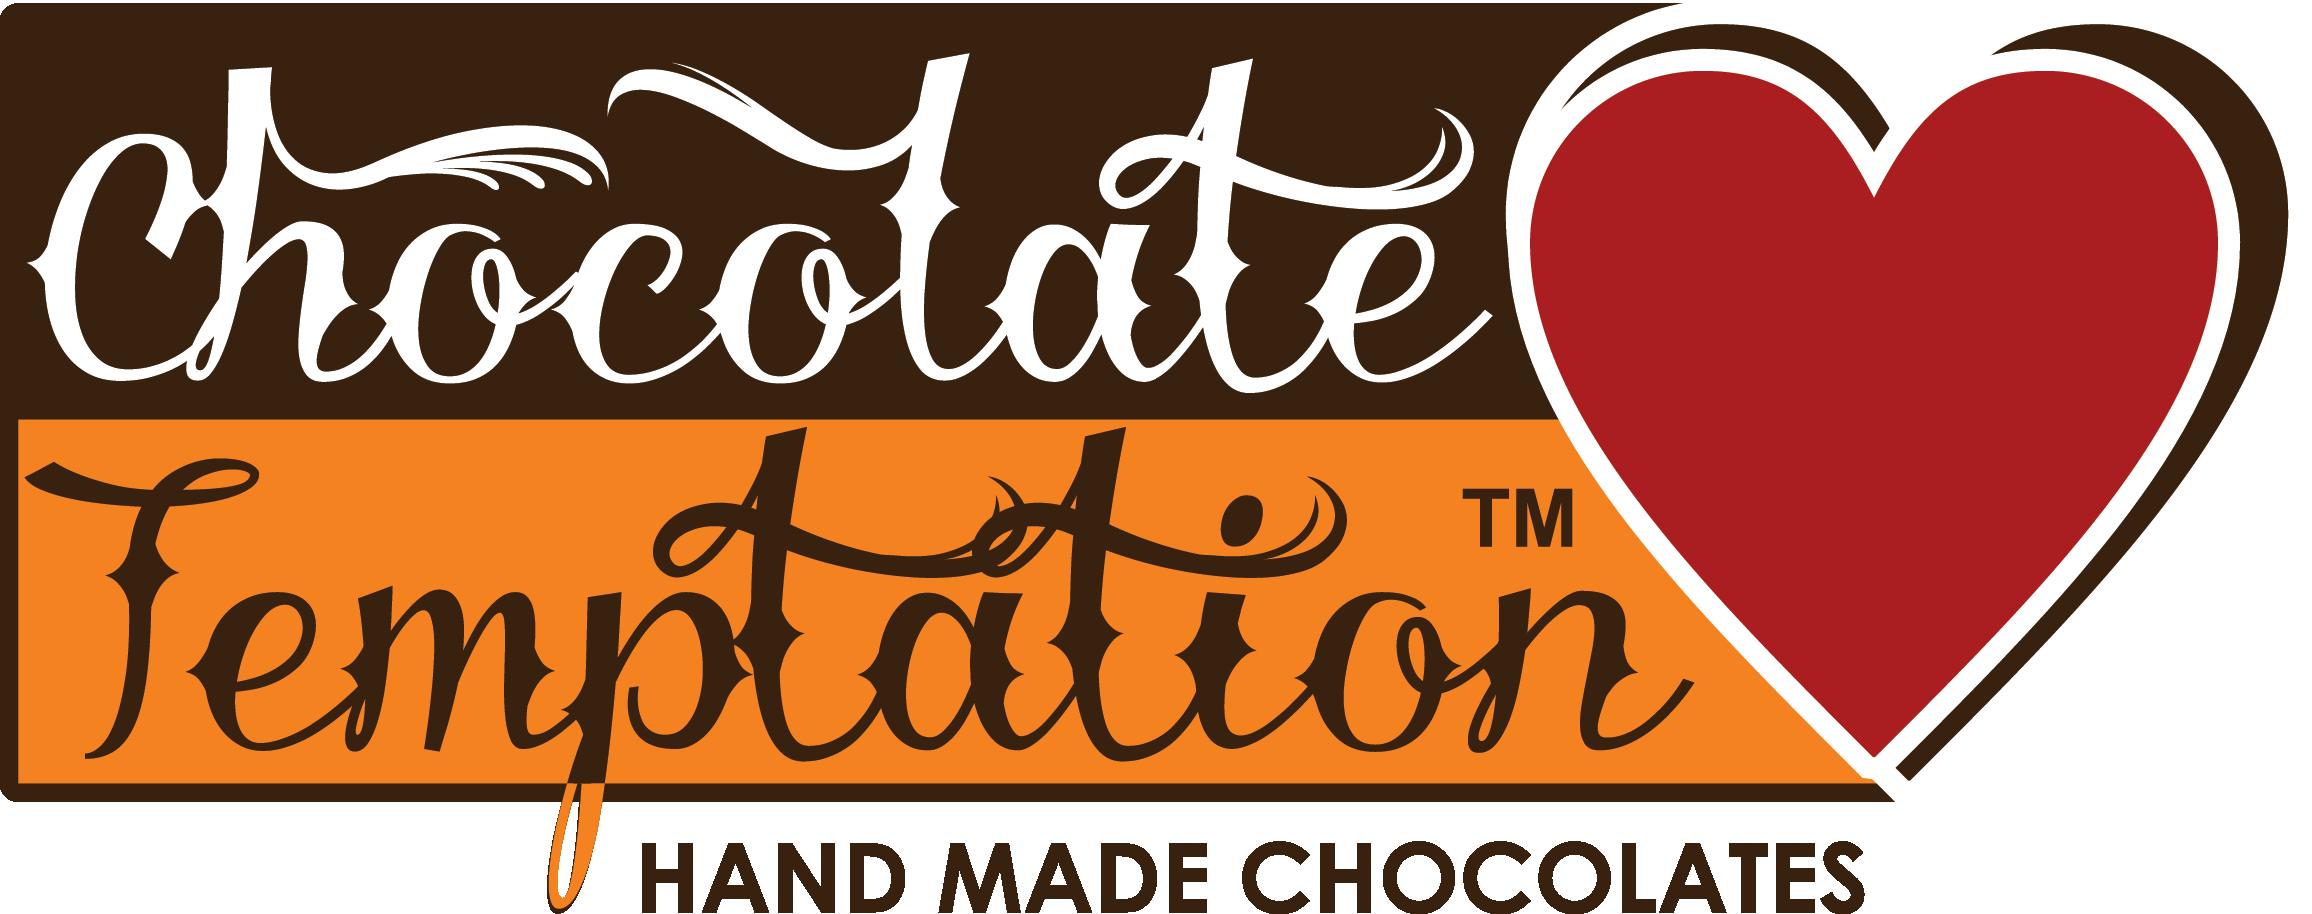 Chocolate Temptation +91-9871119902